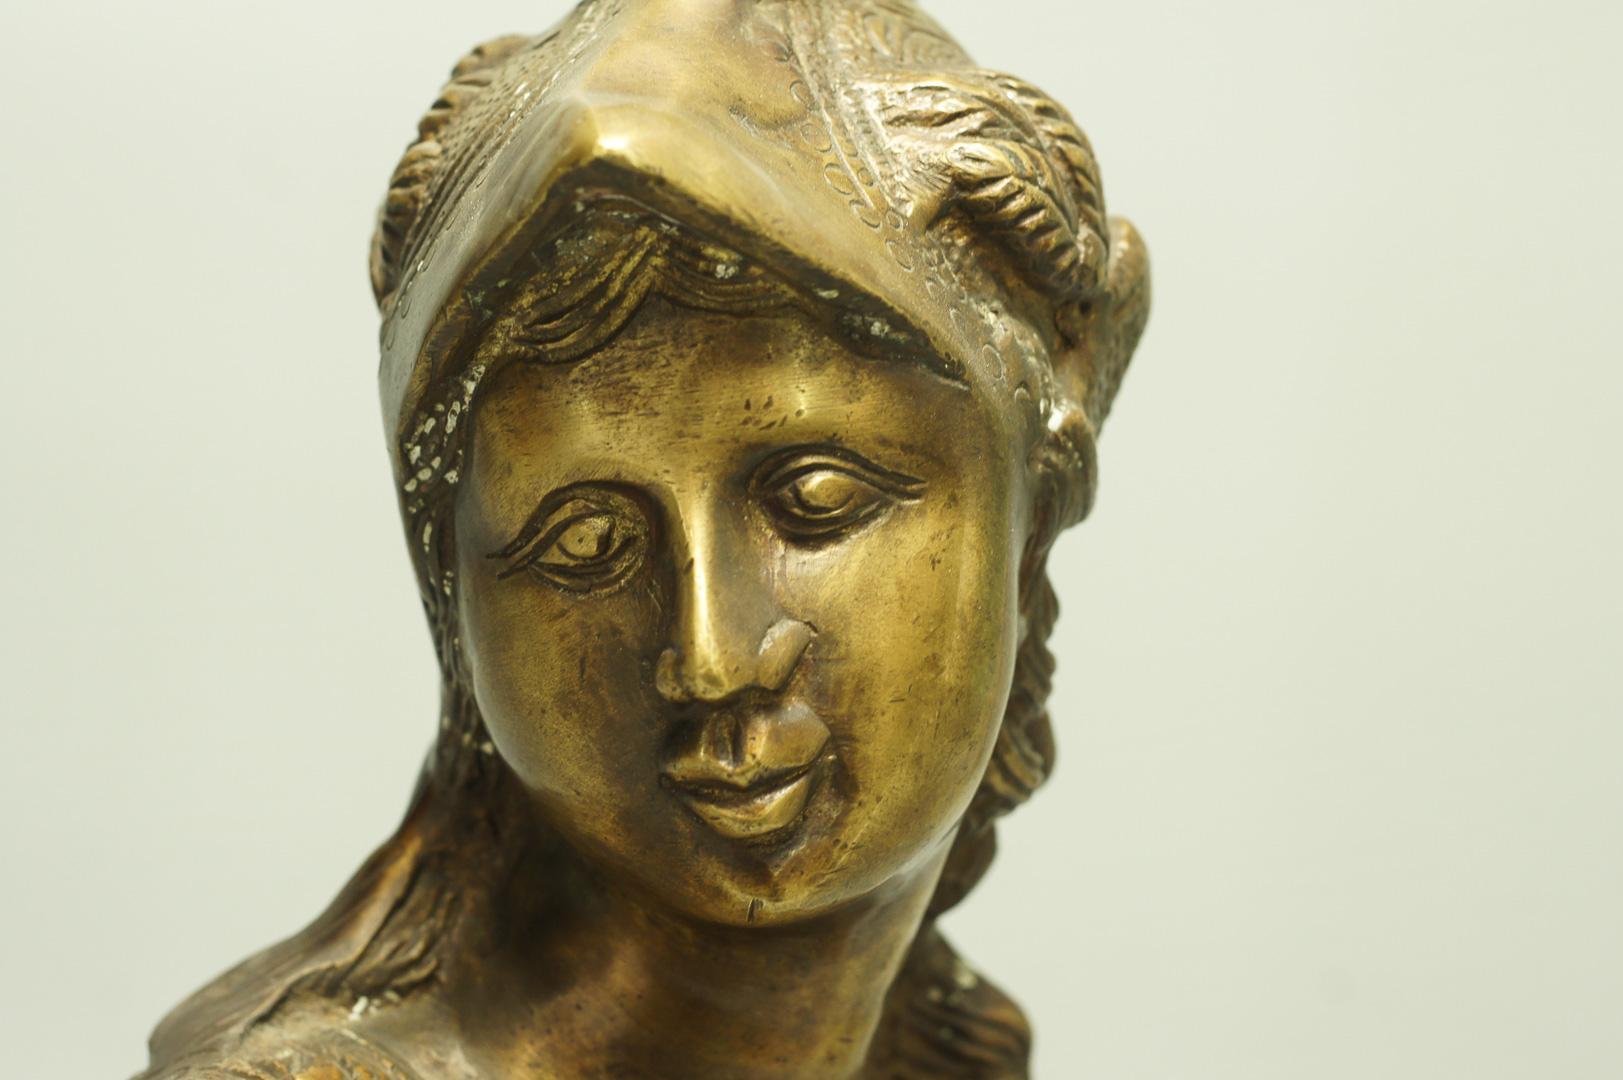 Бюст богиня Афина воительница